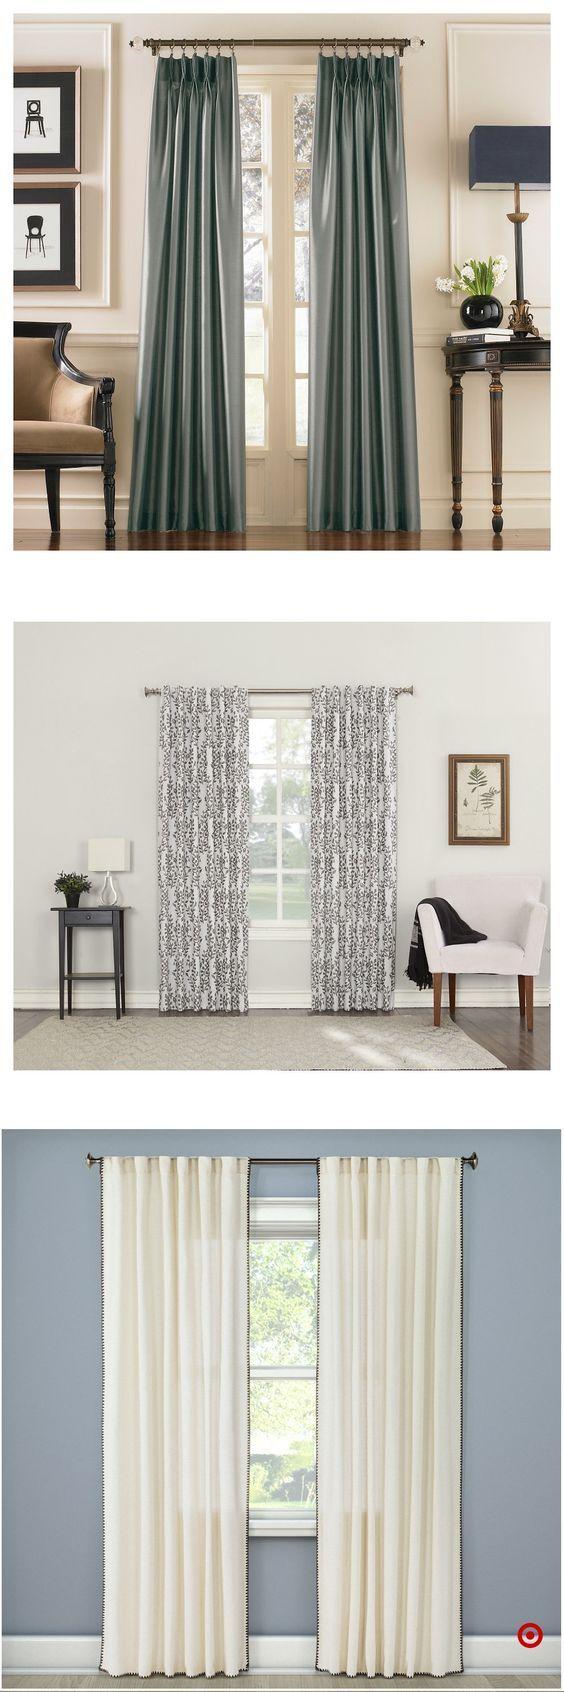 European window coverings  european  beautiful european windows curtains  woonkamer